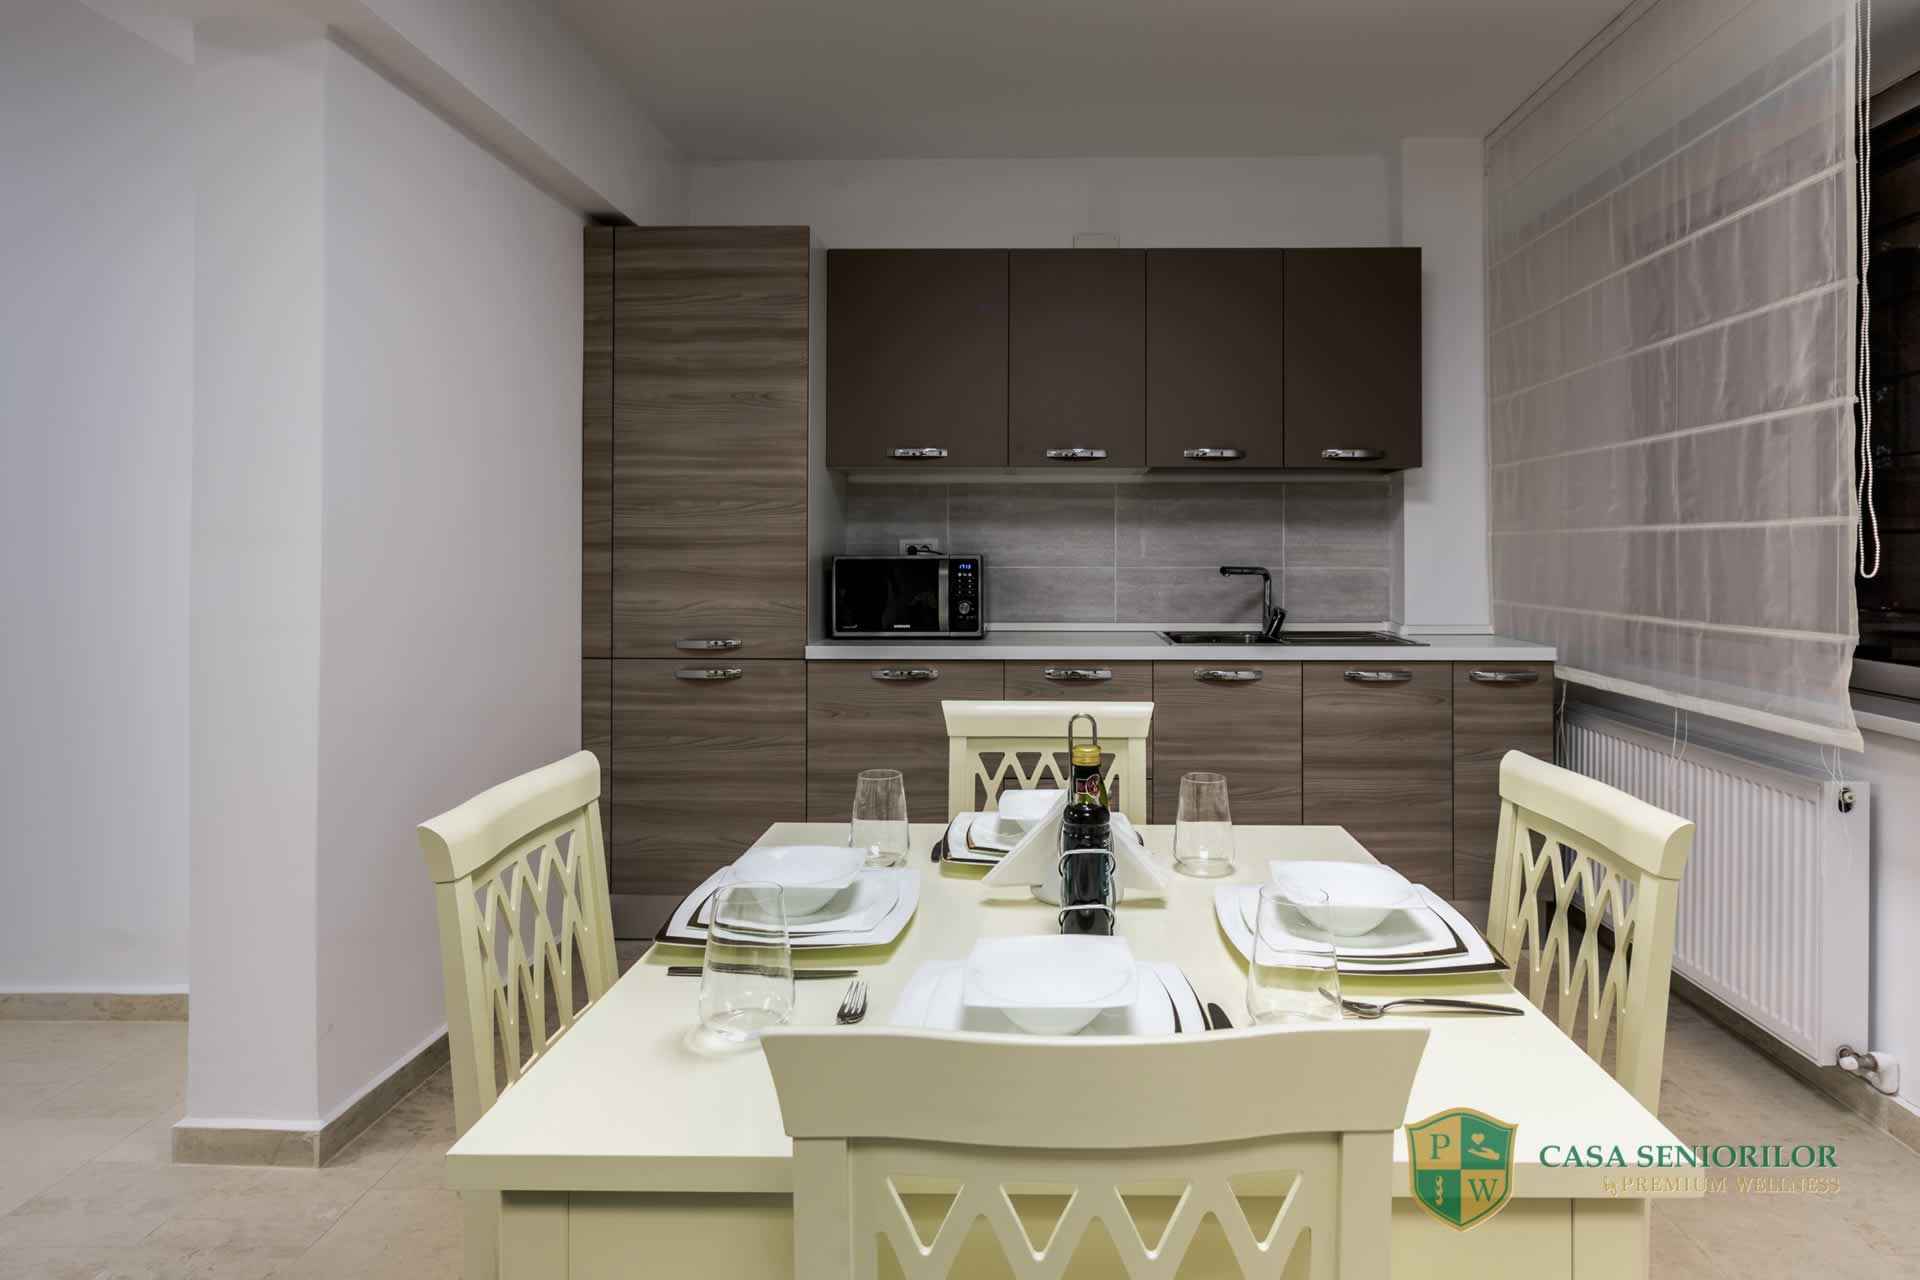 Casa-Seniorilor-Foto-logo-46